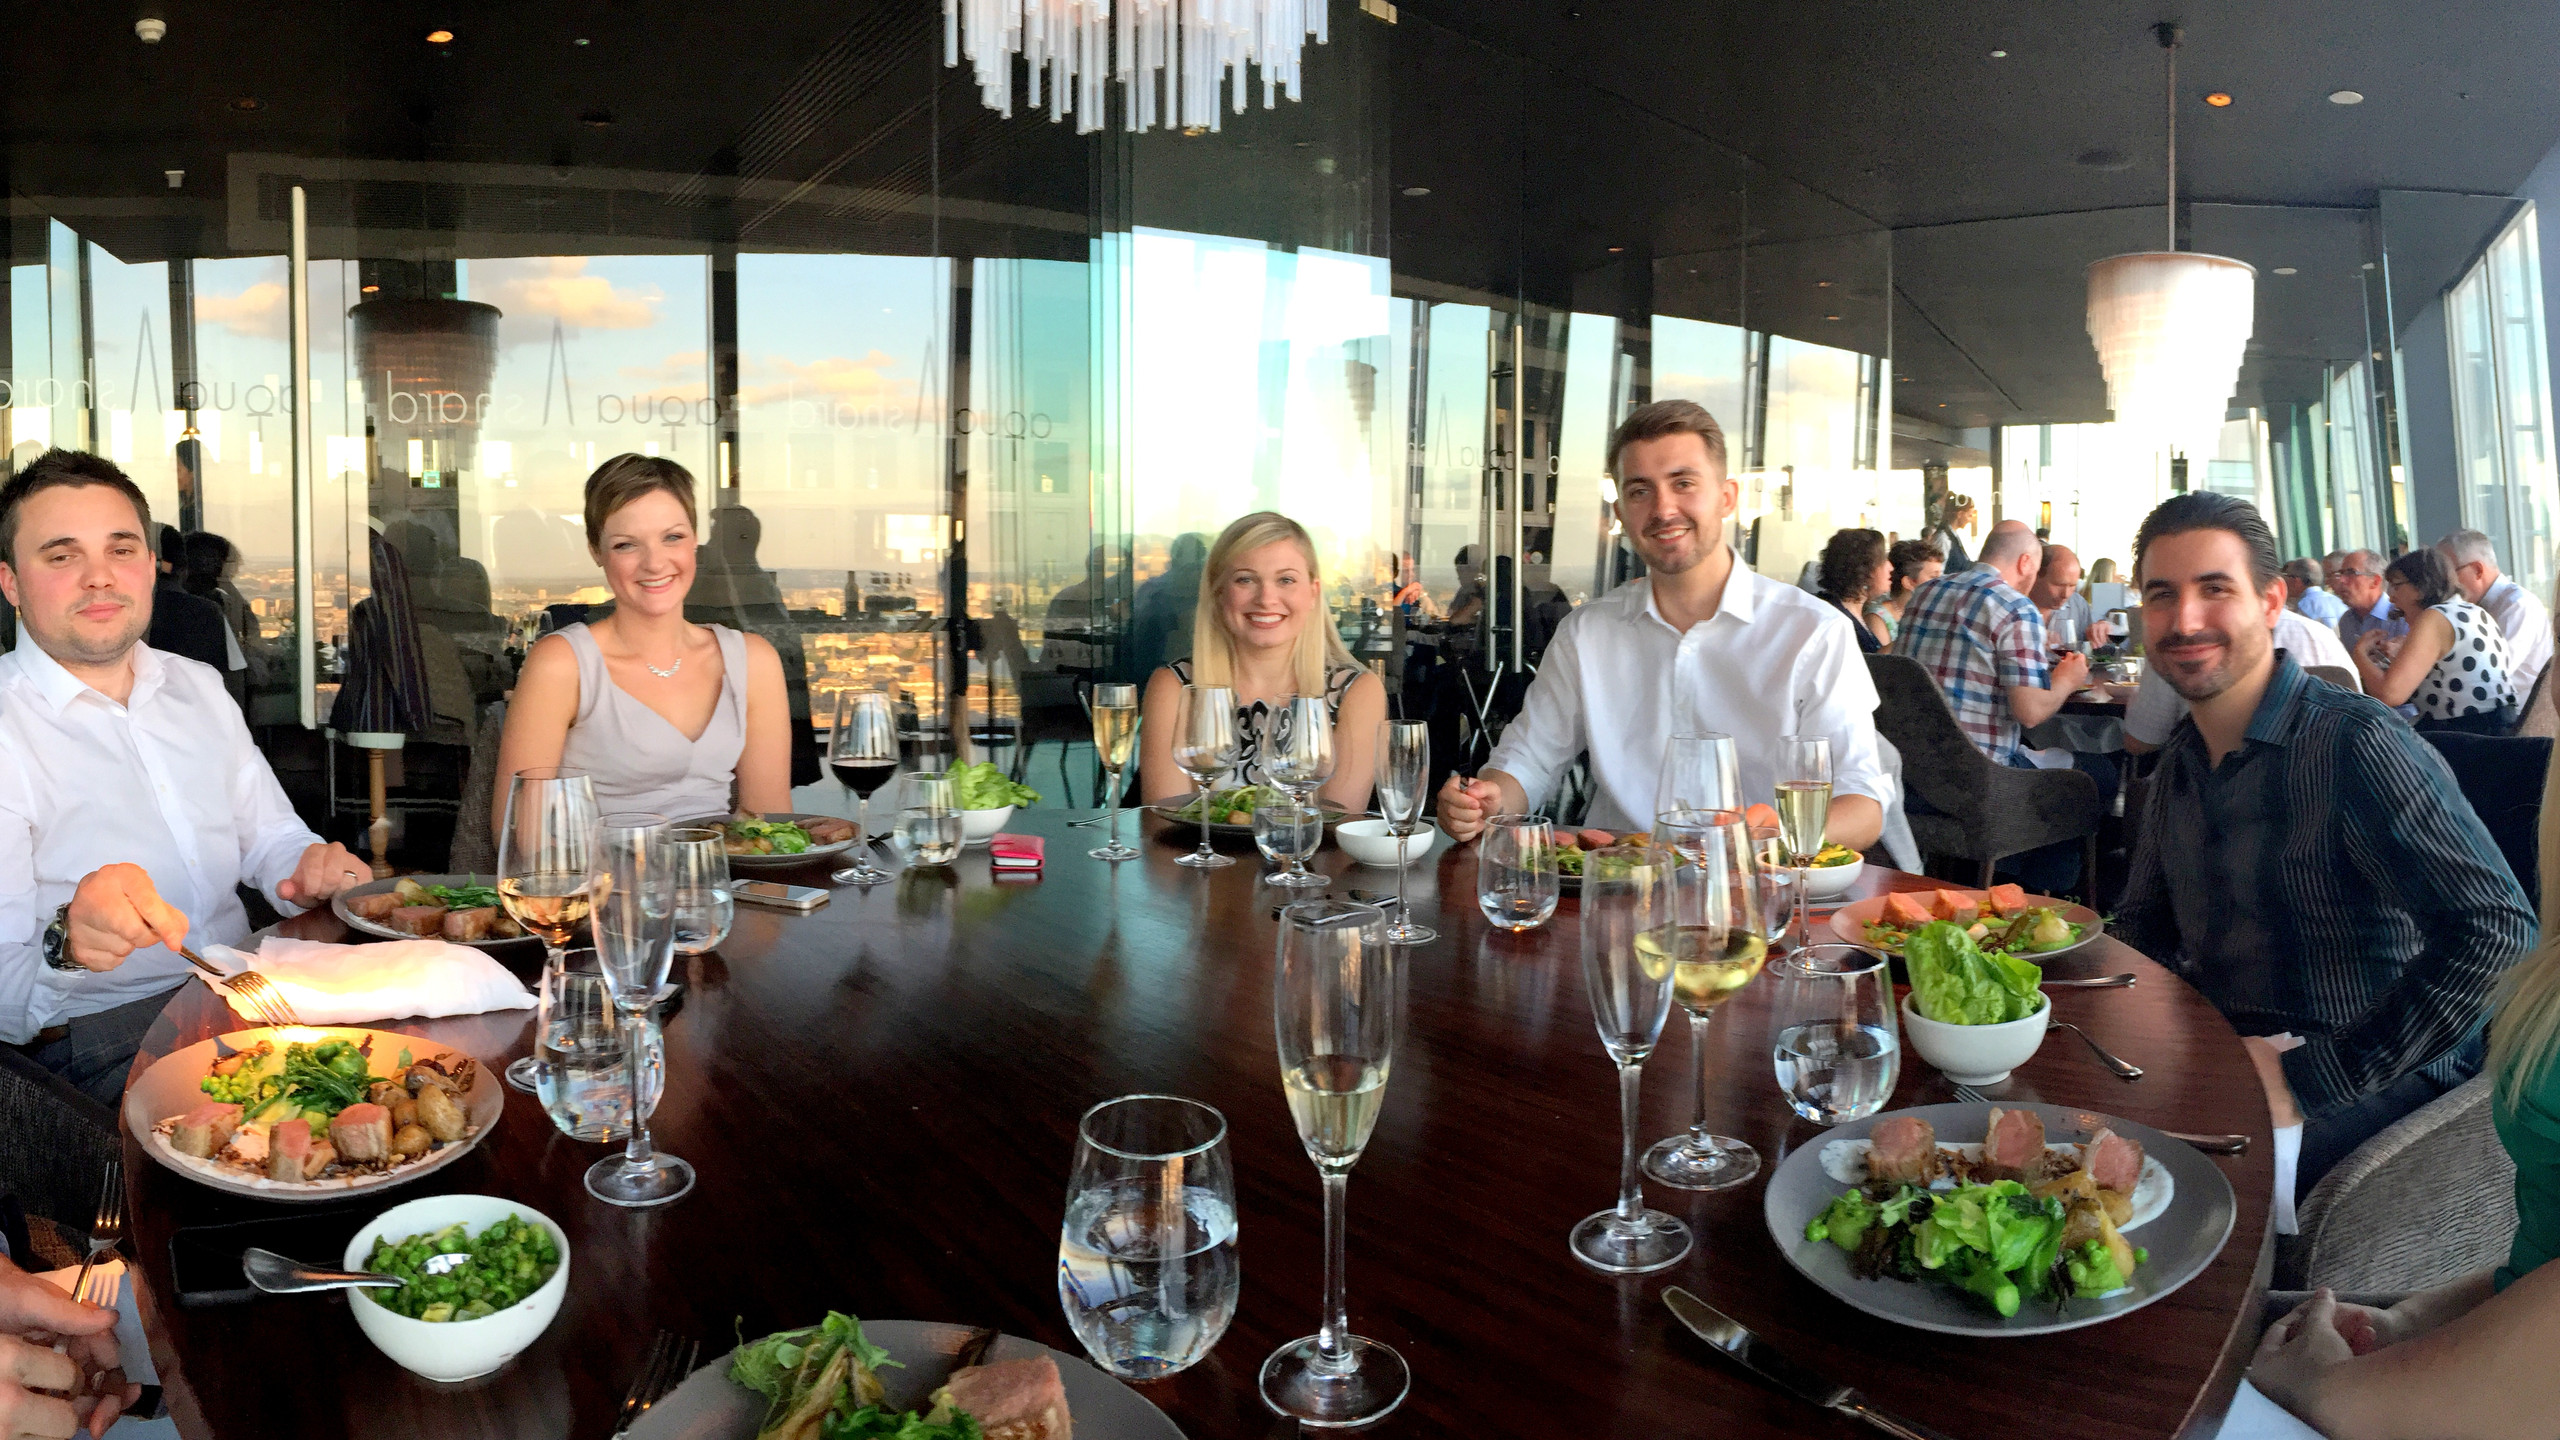 AM Surveying team enjoying the Shard finest dinning overlooking London's city-scape.